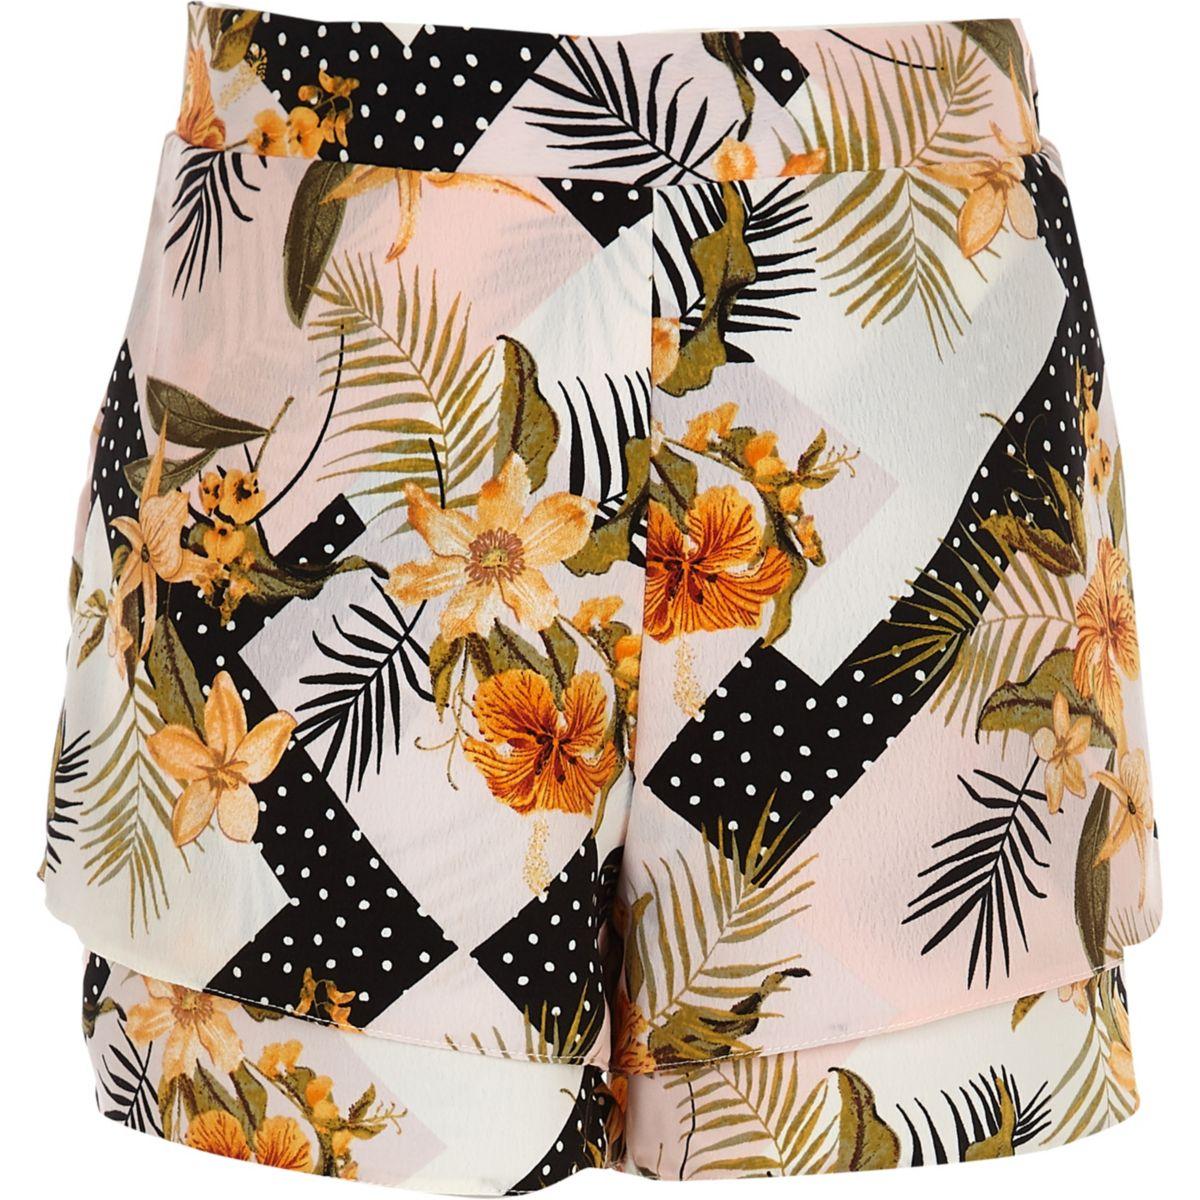 Girls pink floral layered shorts